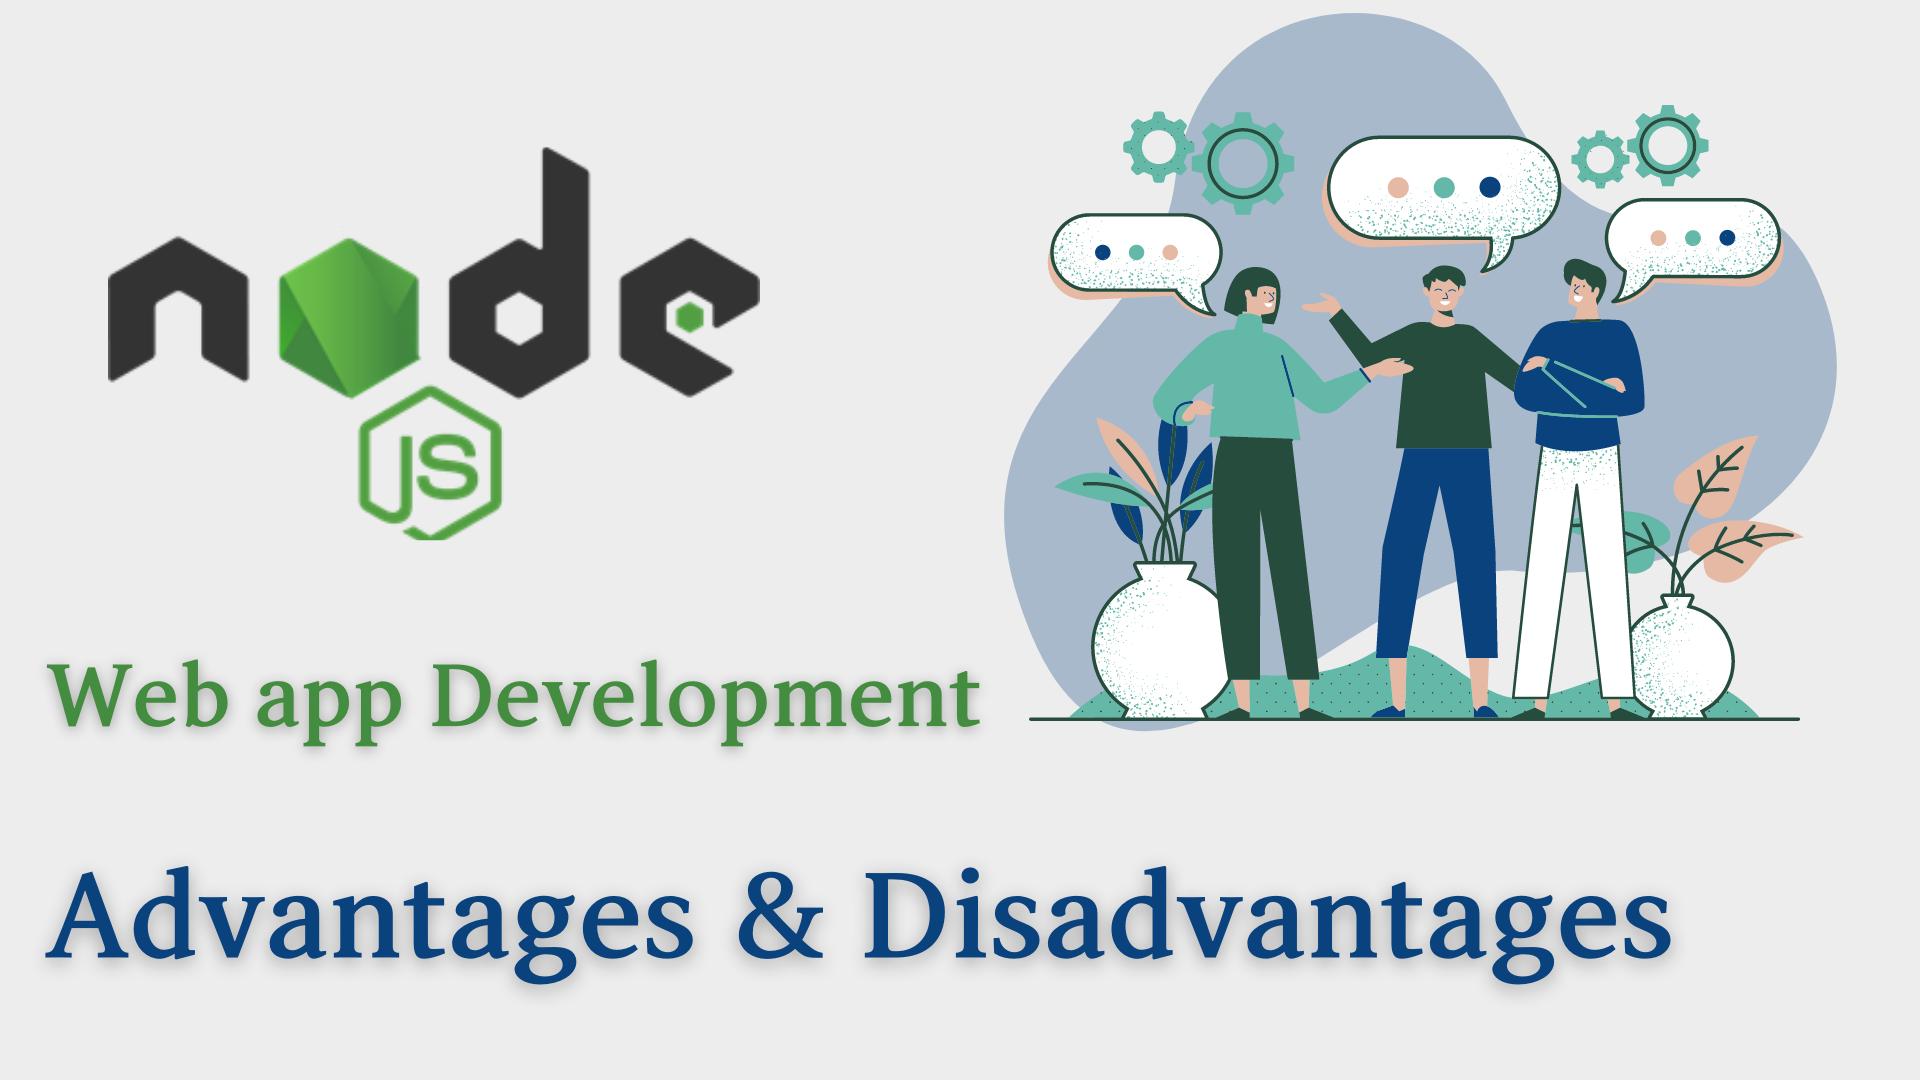 Nodejs - Advantages and Disadvantages